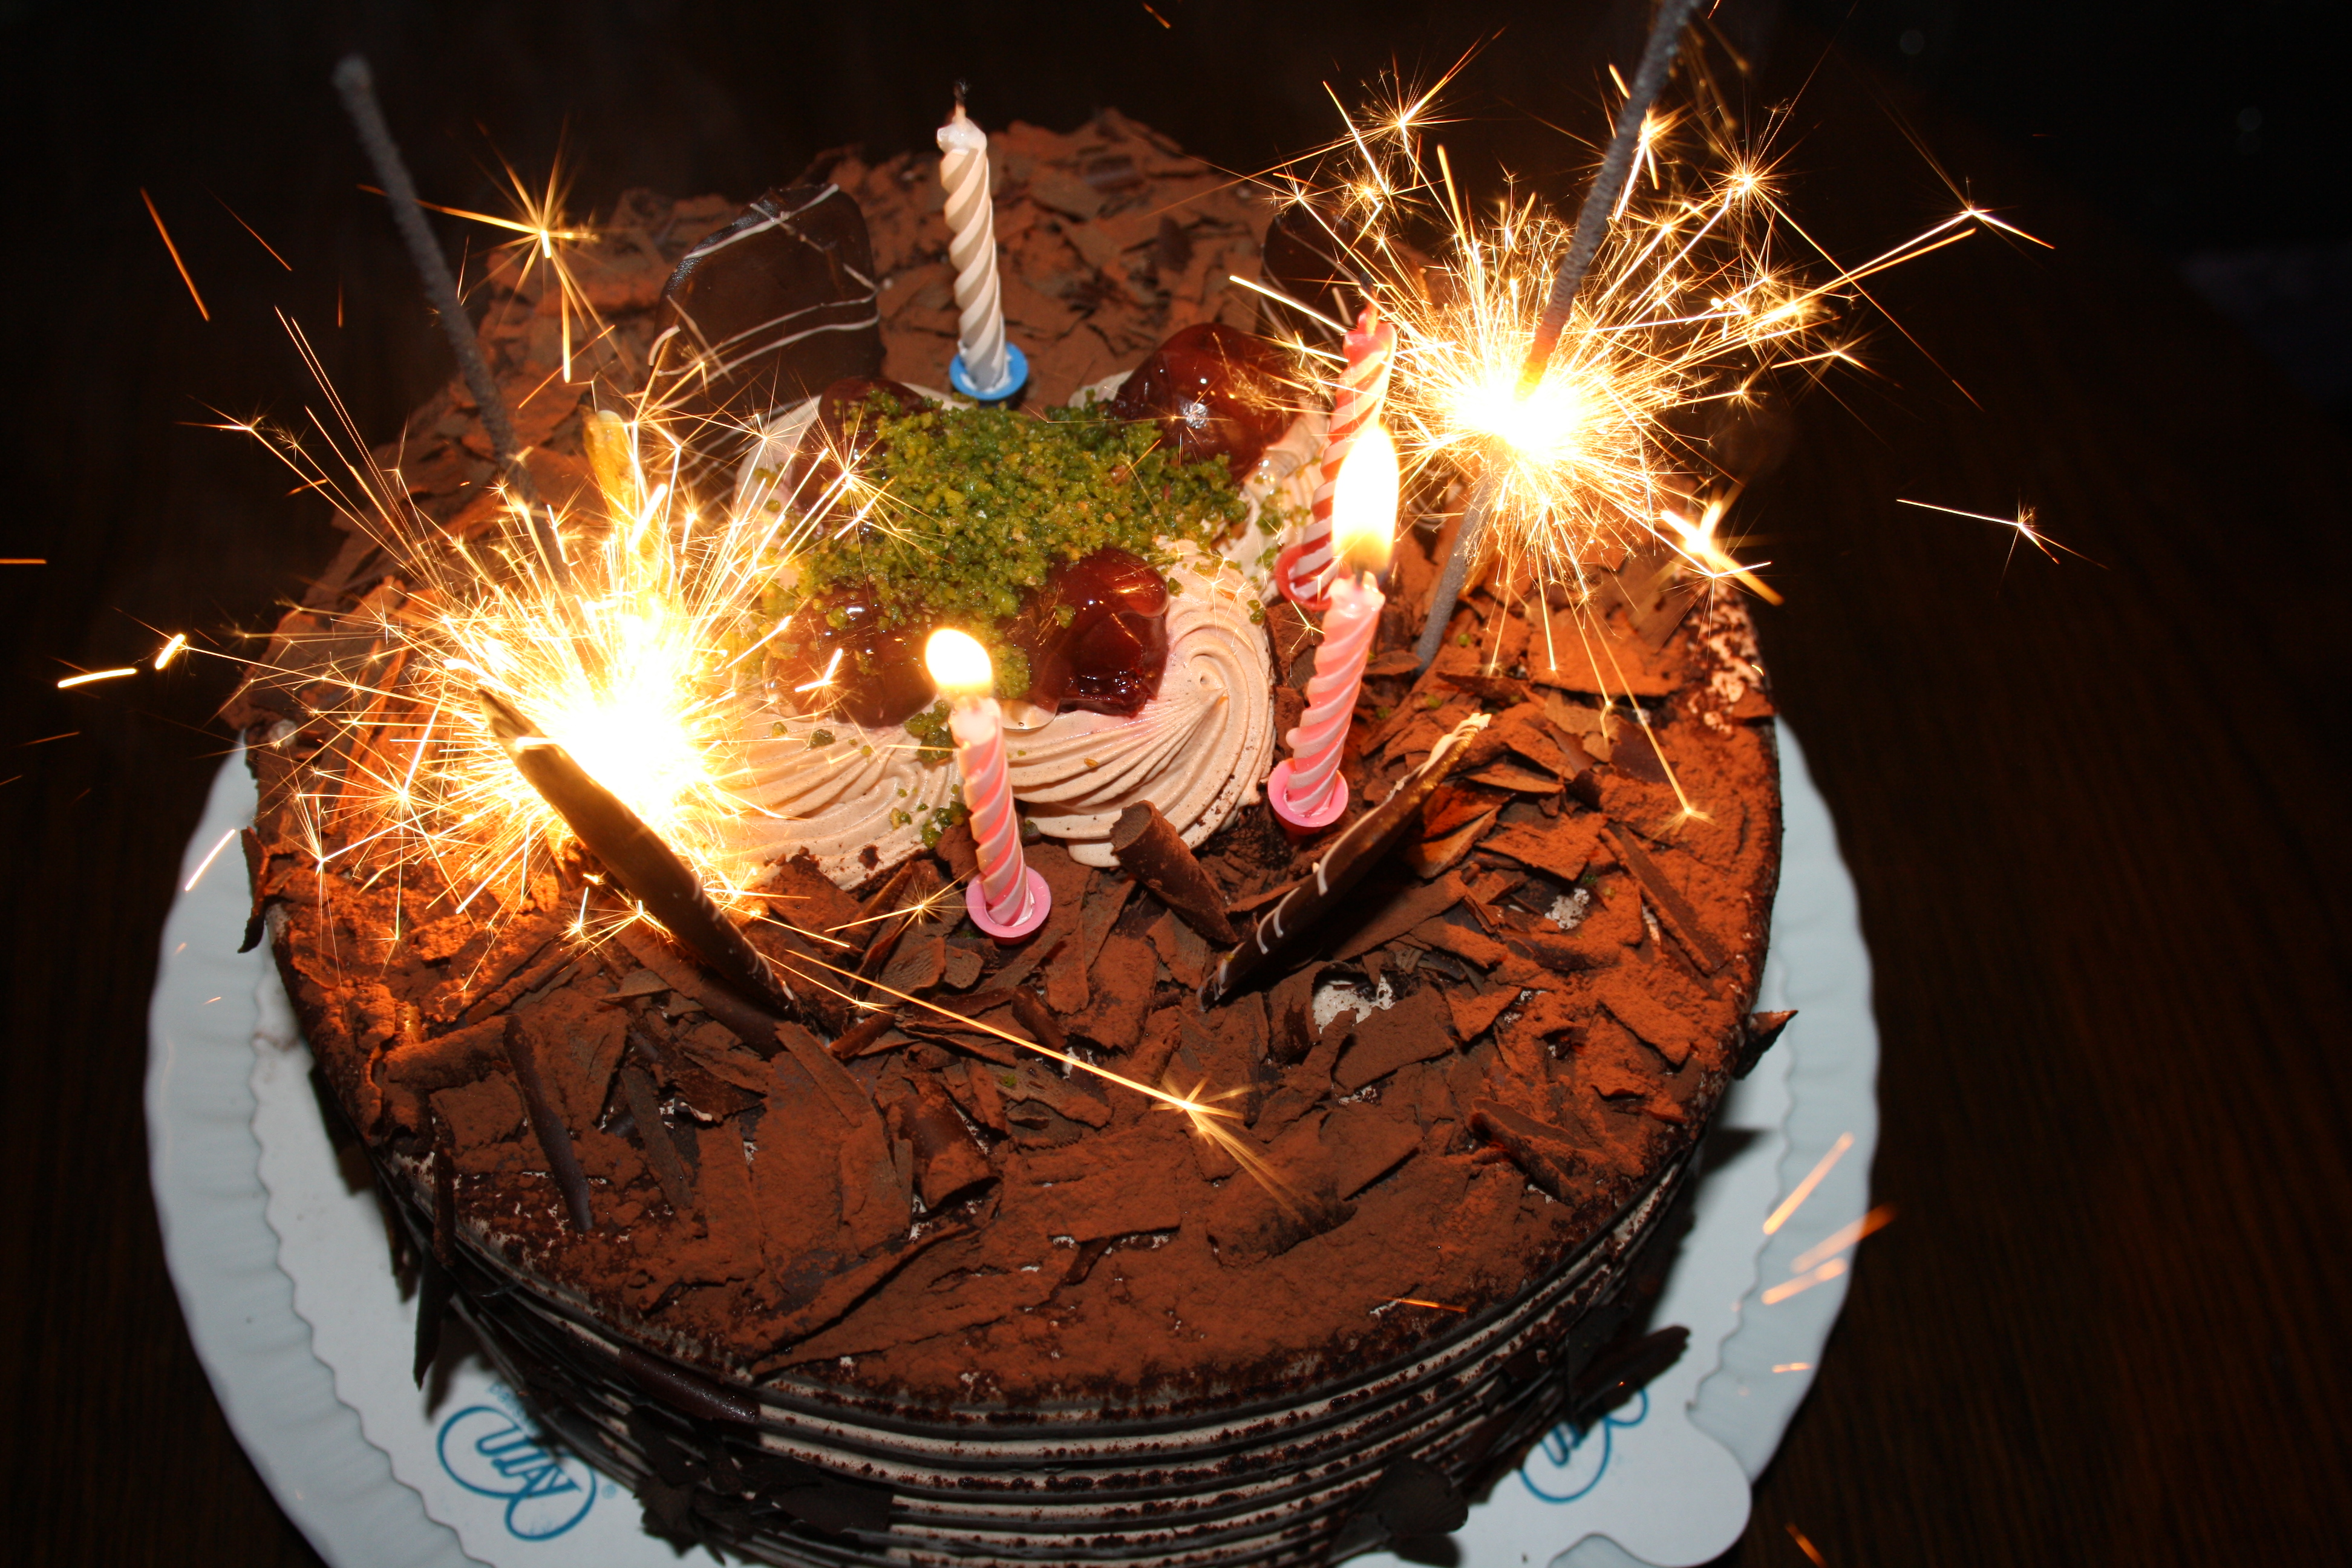 Doğum Günü Pastası - Doğum Günü Pastası Görselleri 6